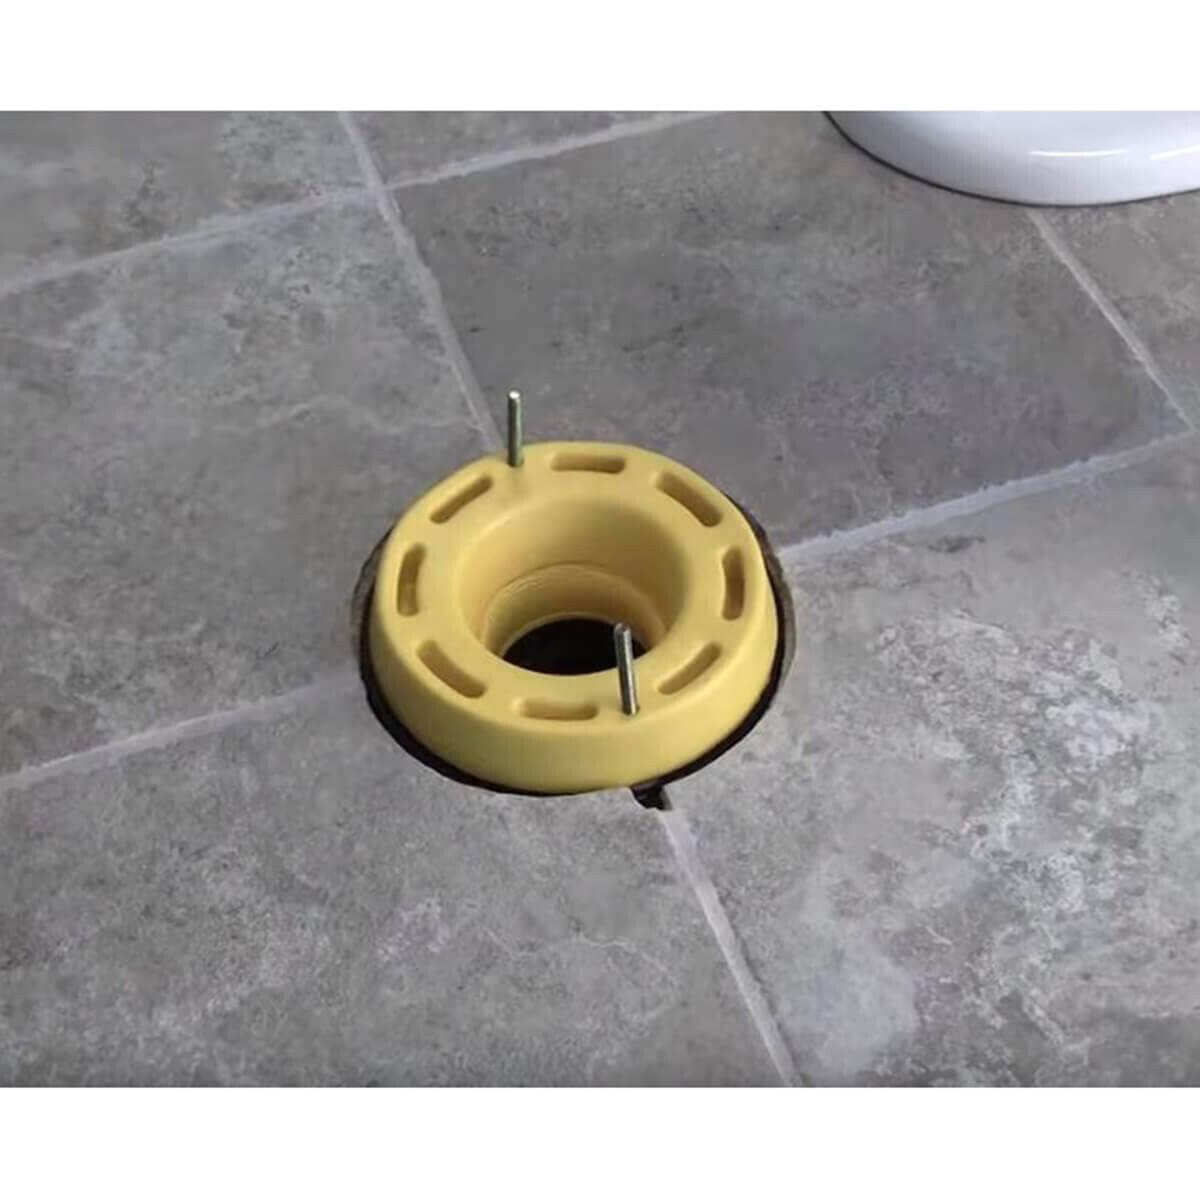 Installing the Barwalt Toilet Seal